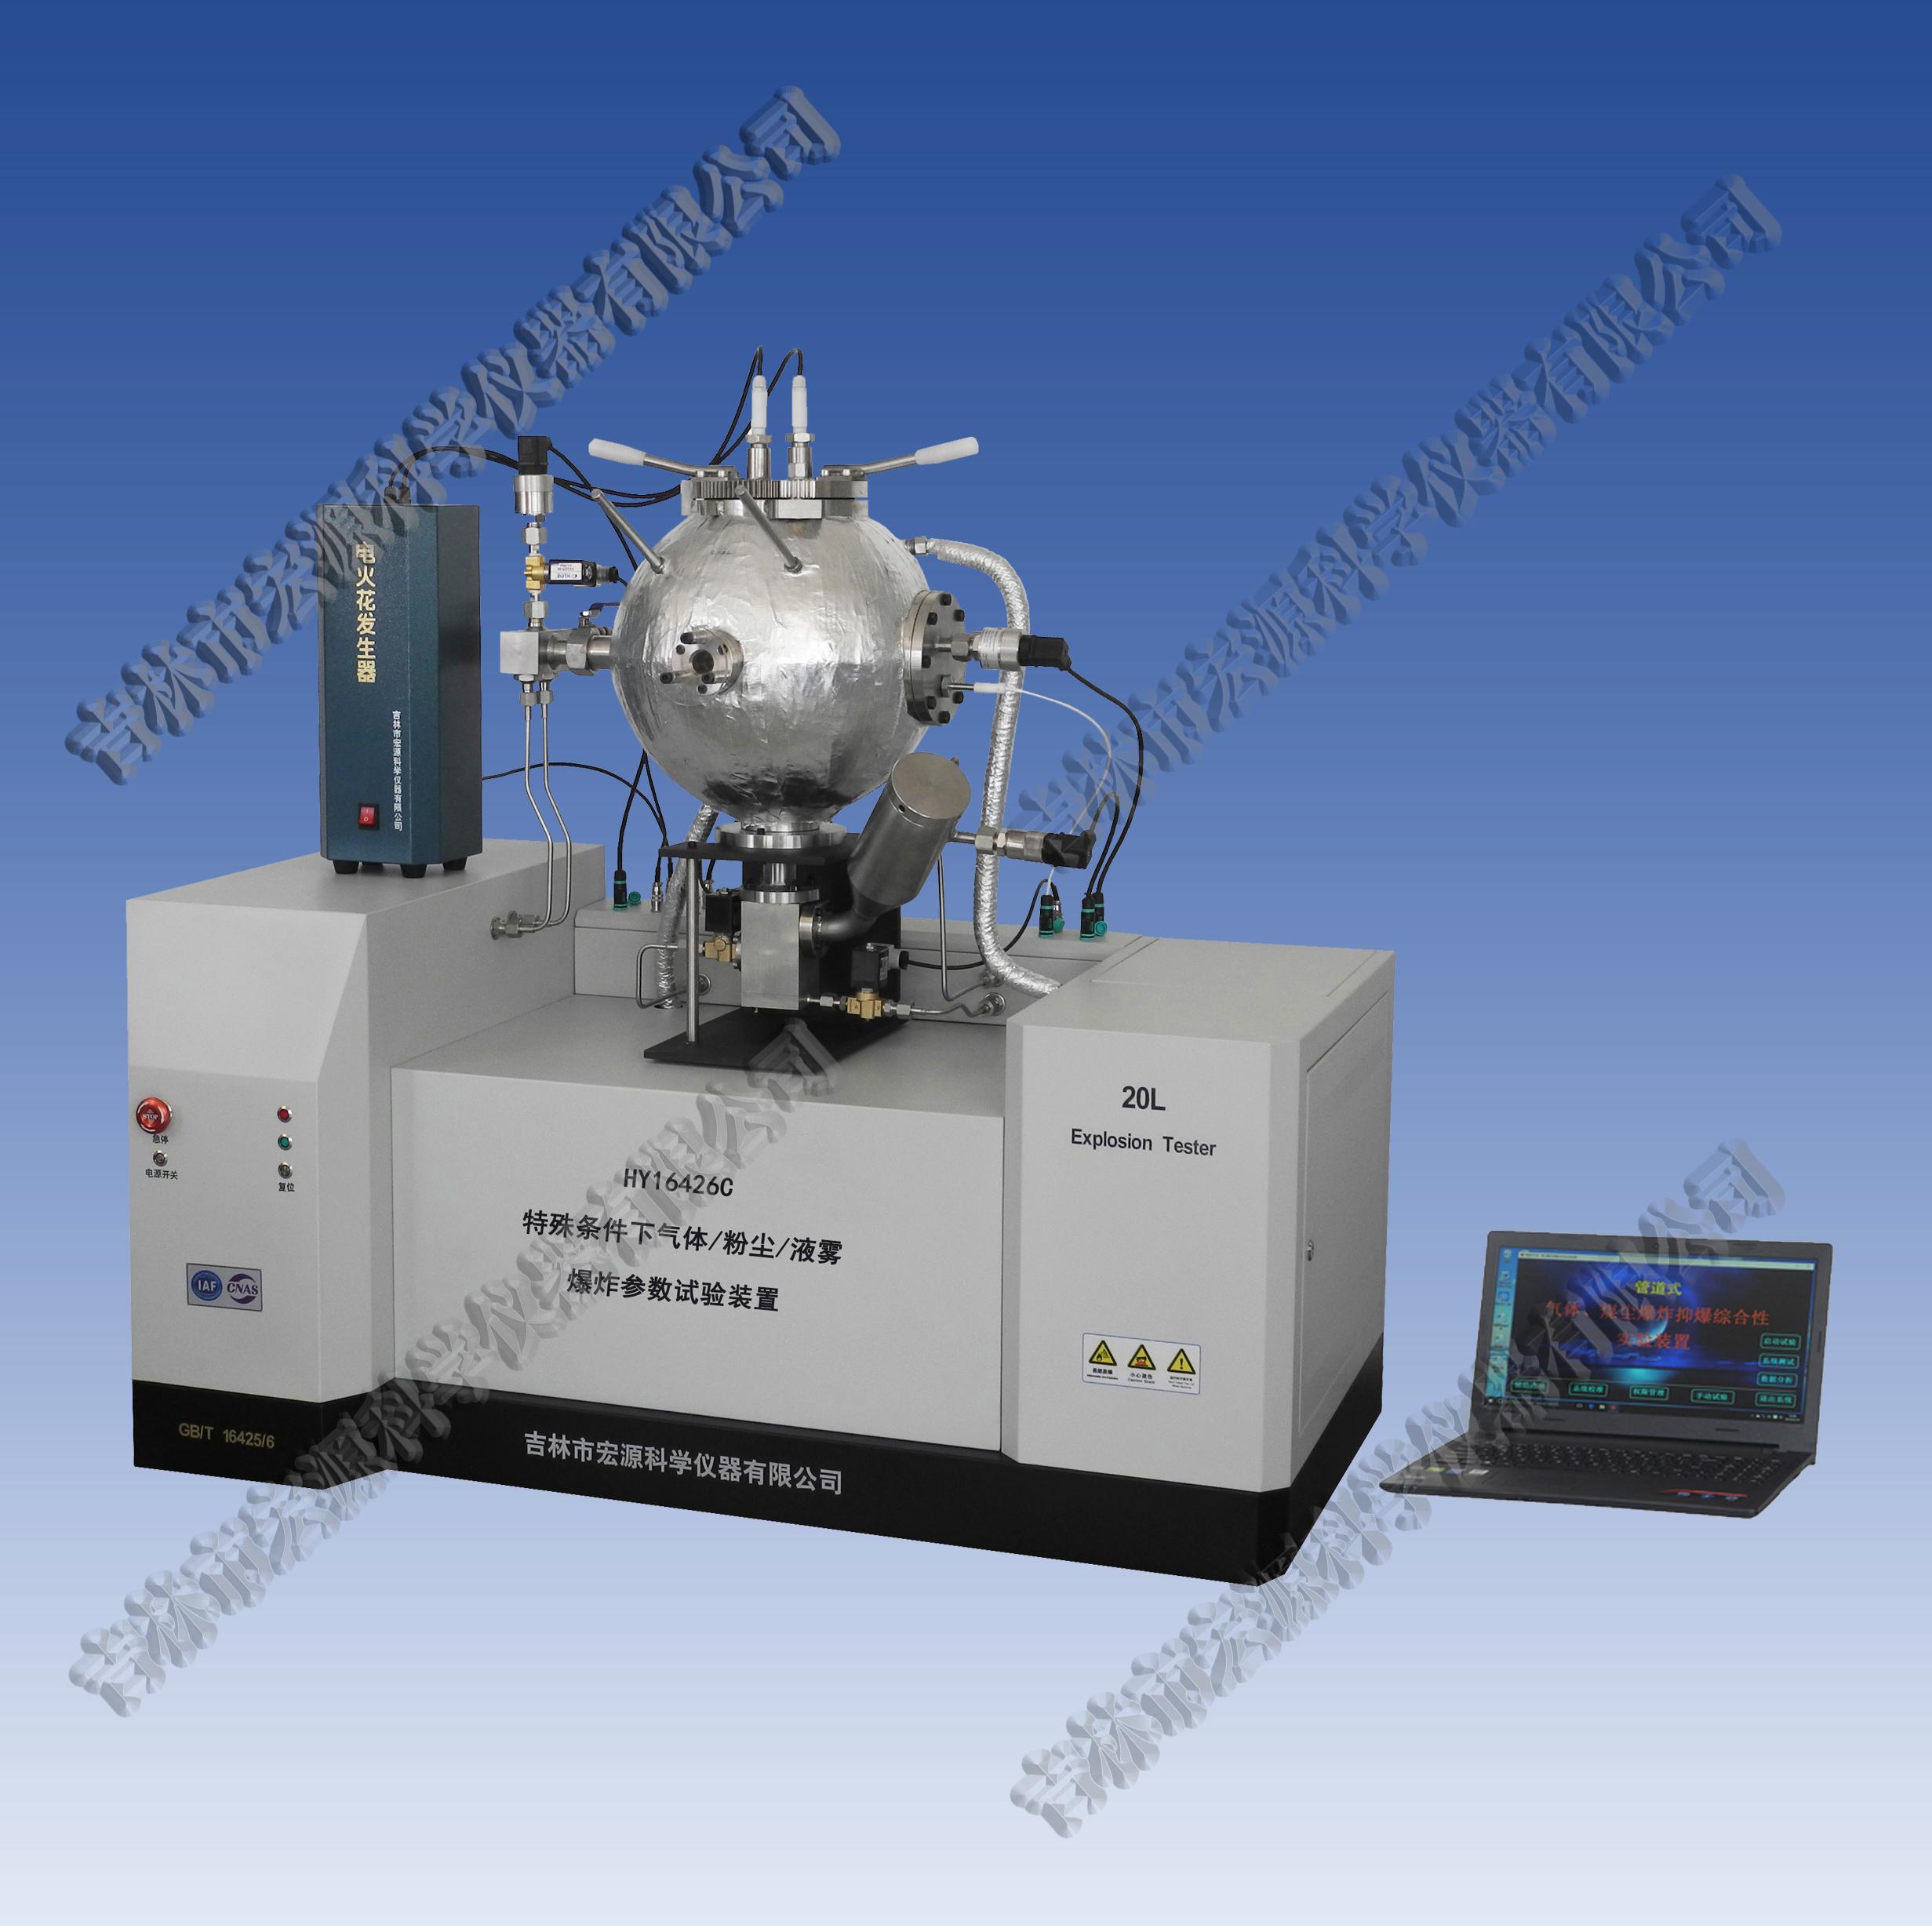 HY16426C 特殊條件下氣體/粉塵/液霧爆炸參數試驗裝置(20L球型)